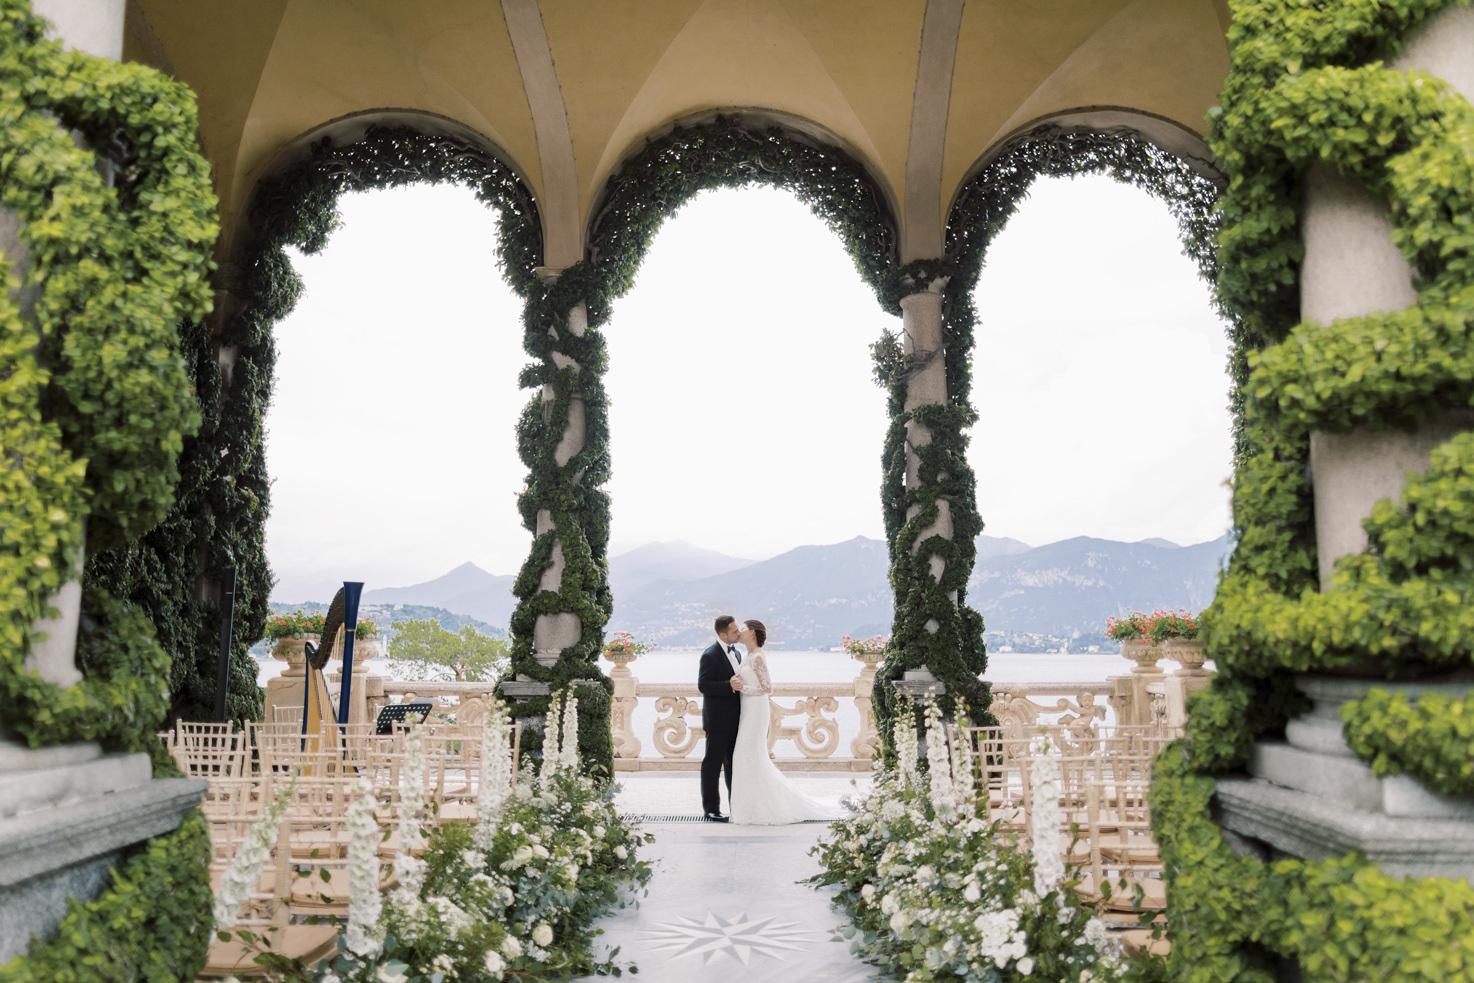 Wedding ceremony in the Loggia